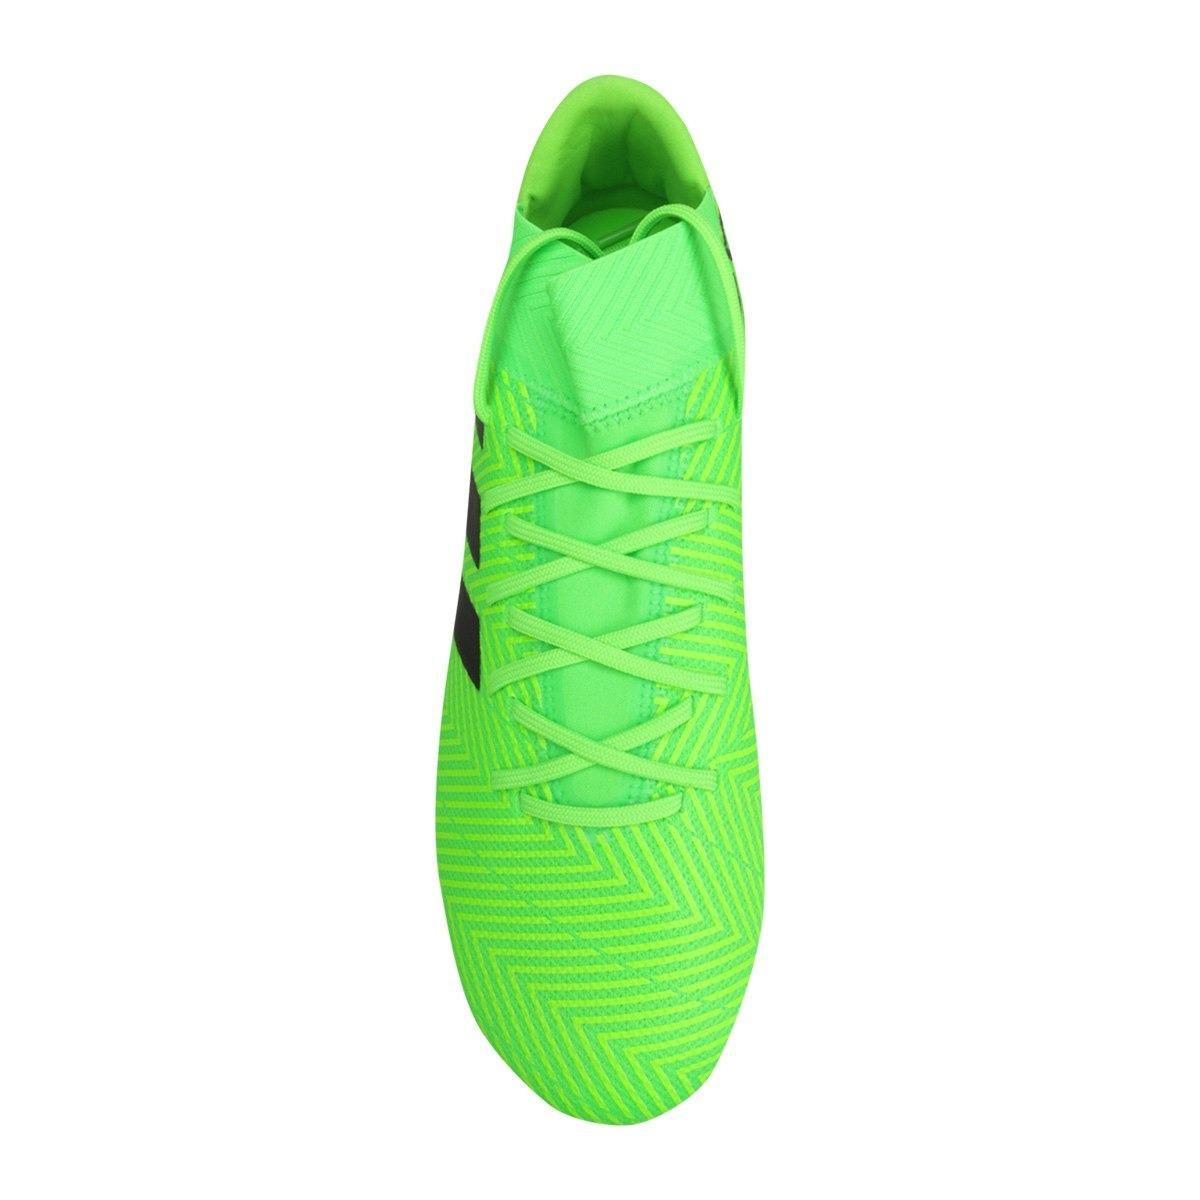 14baa787ab311 chuteira campo adidas nemeziz messi 18 3 fg masculina - verd. Carregando  zoom.